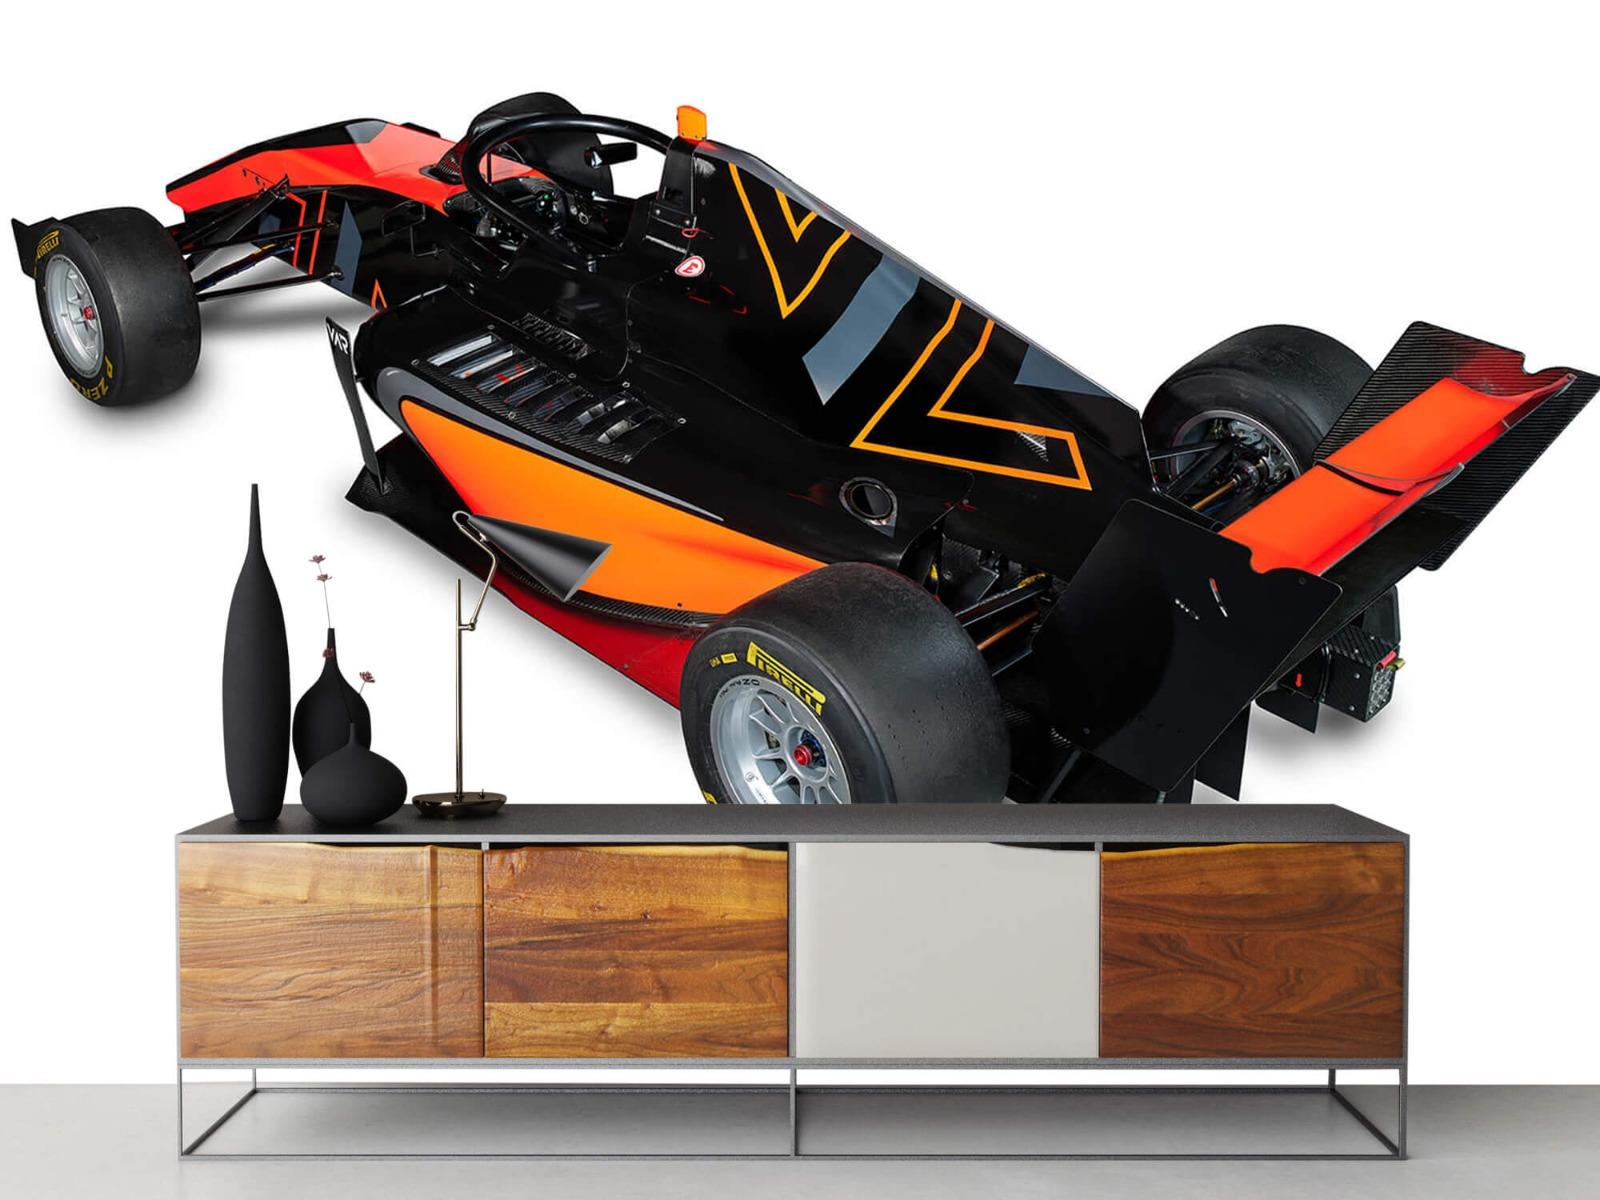 Sportauto's - Formula 3 - Rear left view - Hobbykamer 16